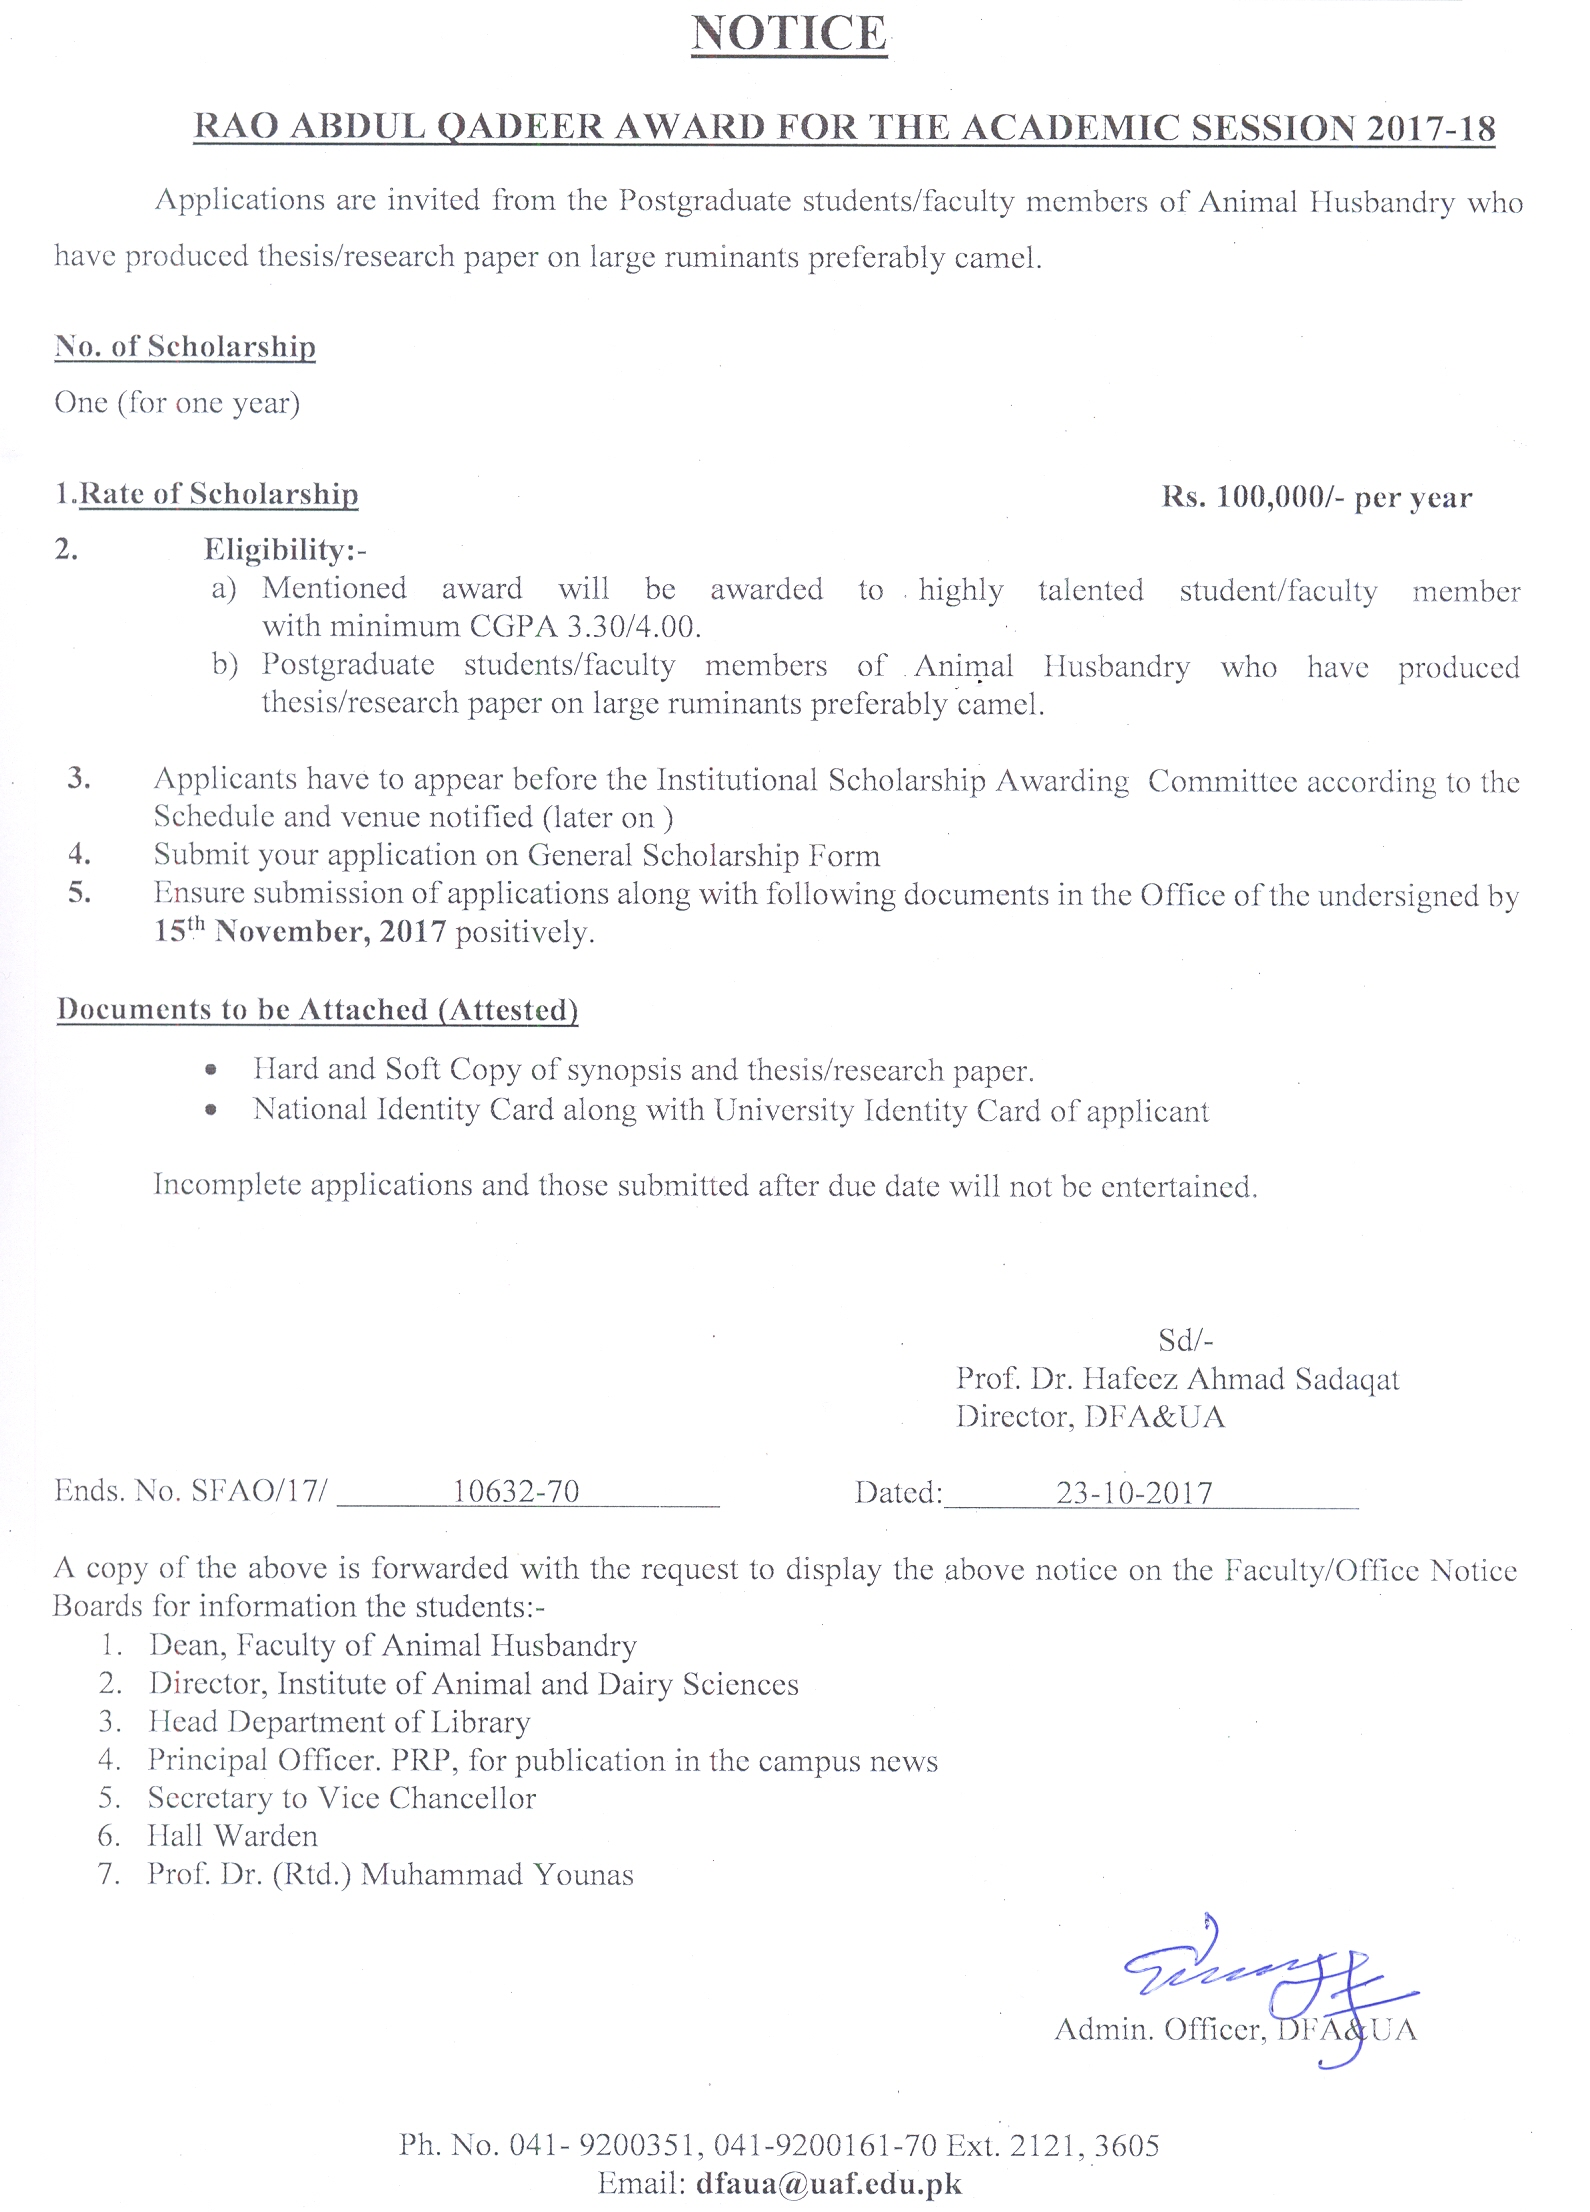 University Of Agriculture Faisalabad Pakistan Directorate Of